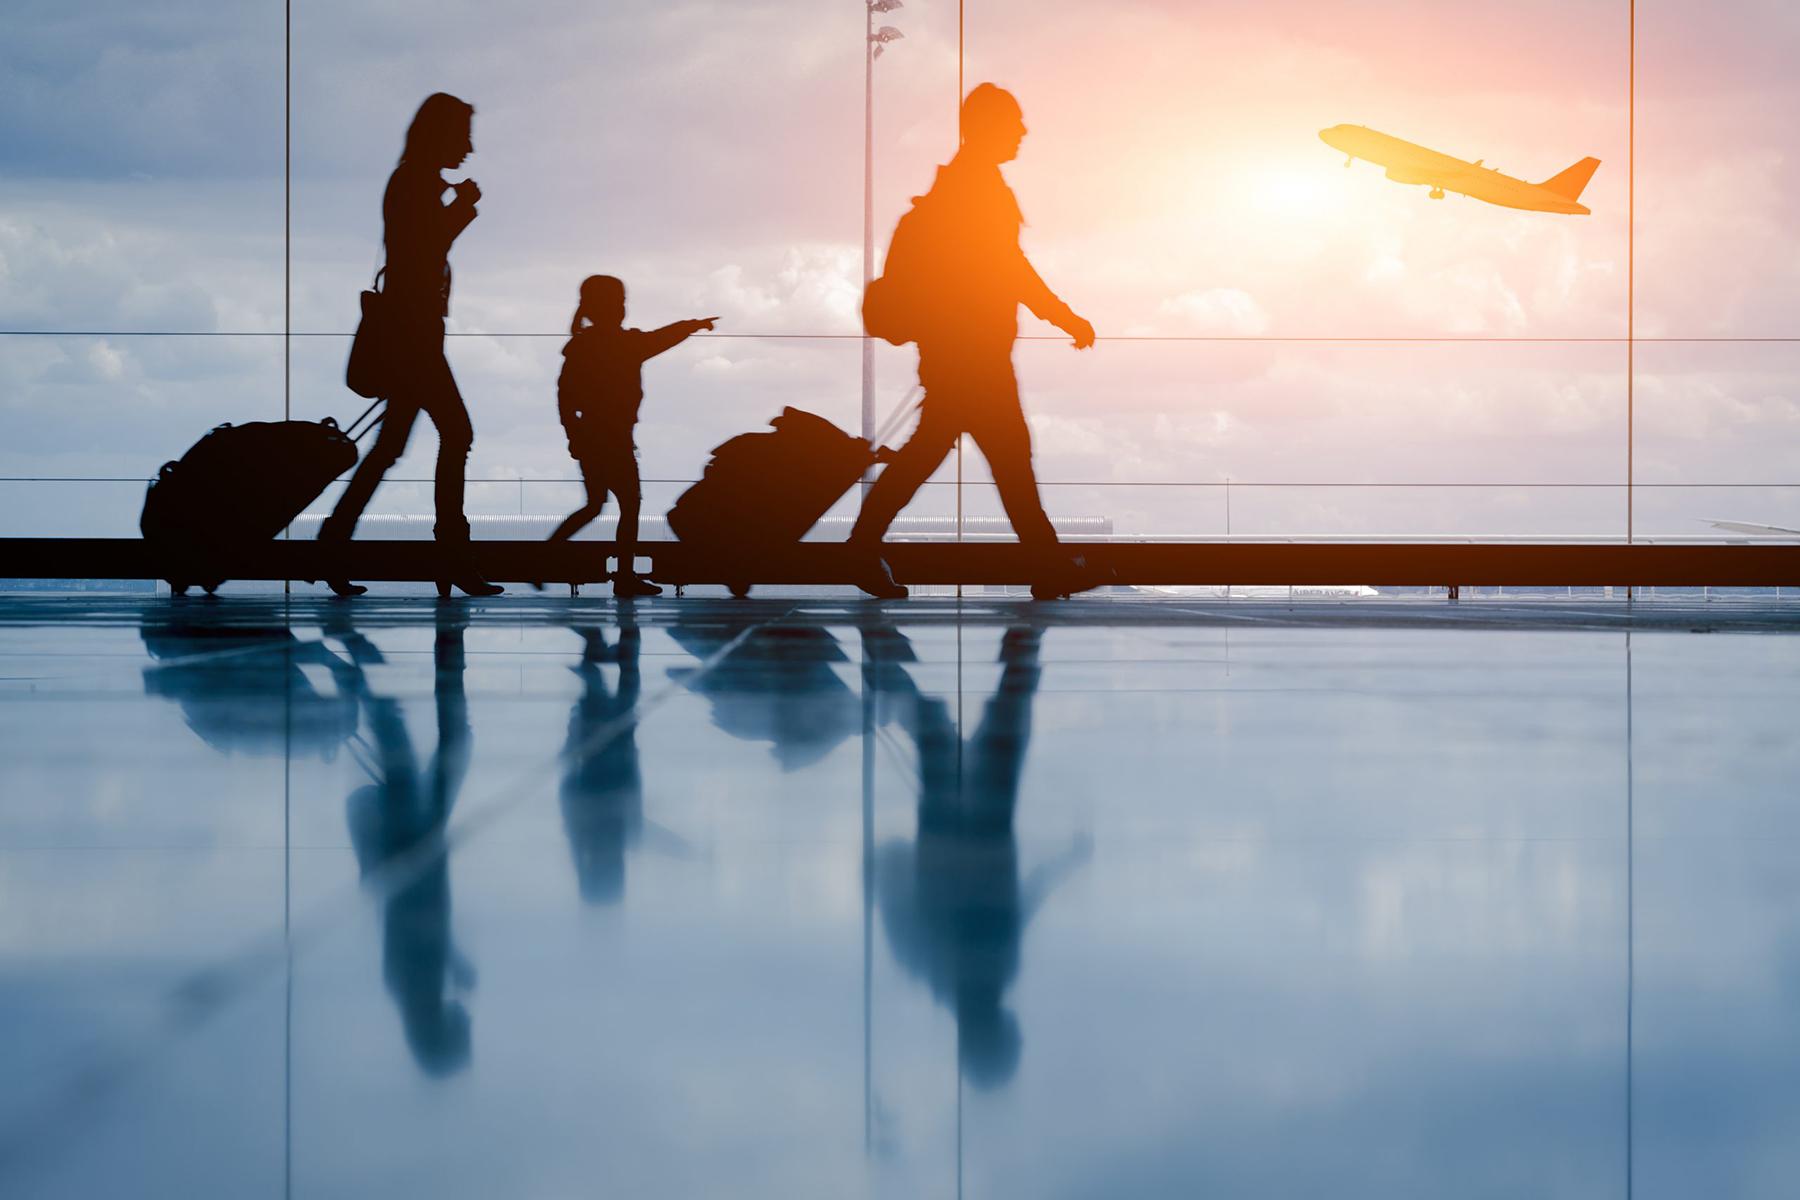 Family walking through an airport